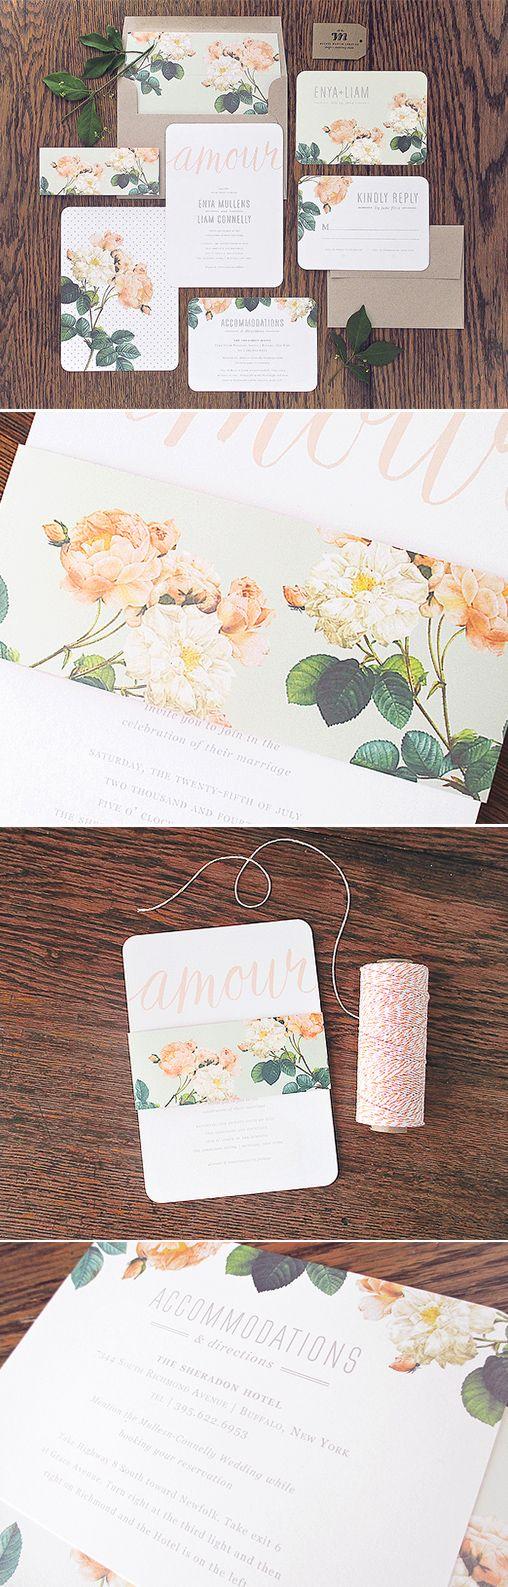 floral stationery | pastel wedding ideas | kraft paper envelopes | wedding invitations | Rachel Marvin Creative |